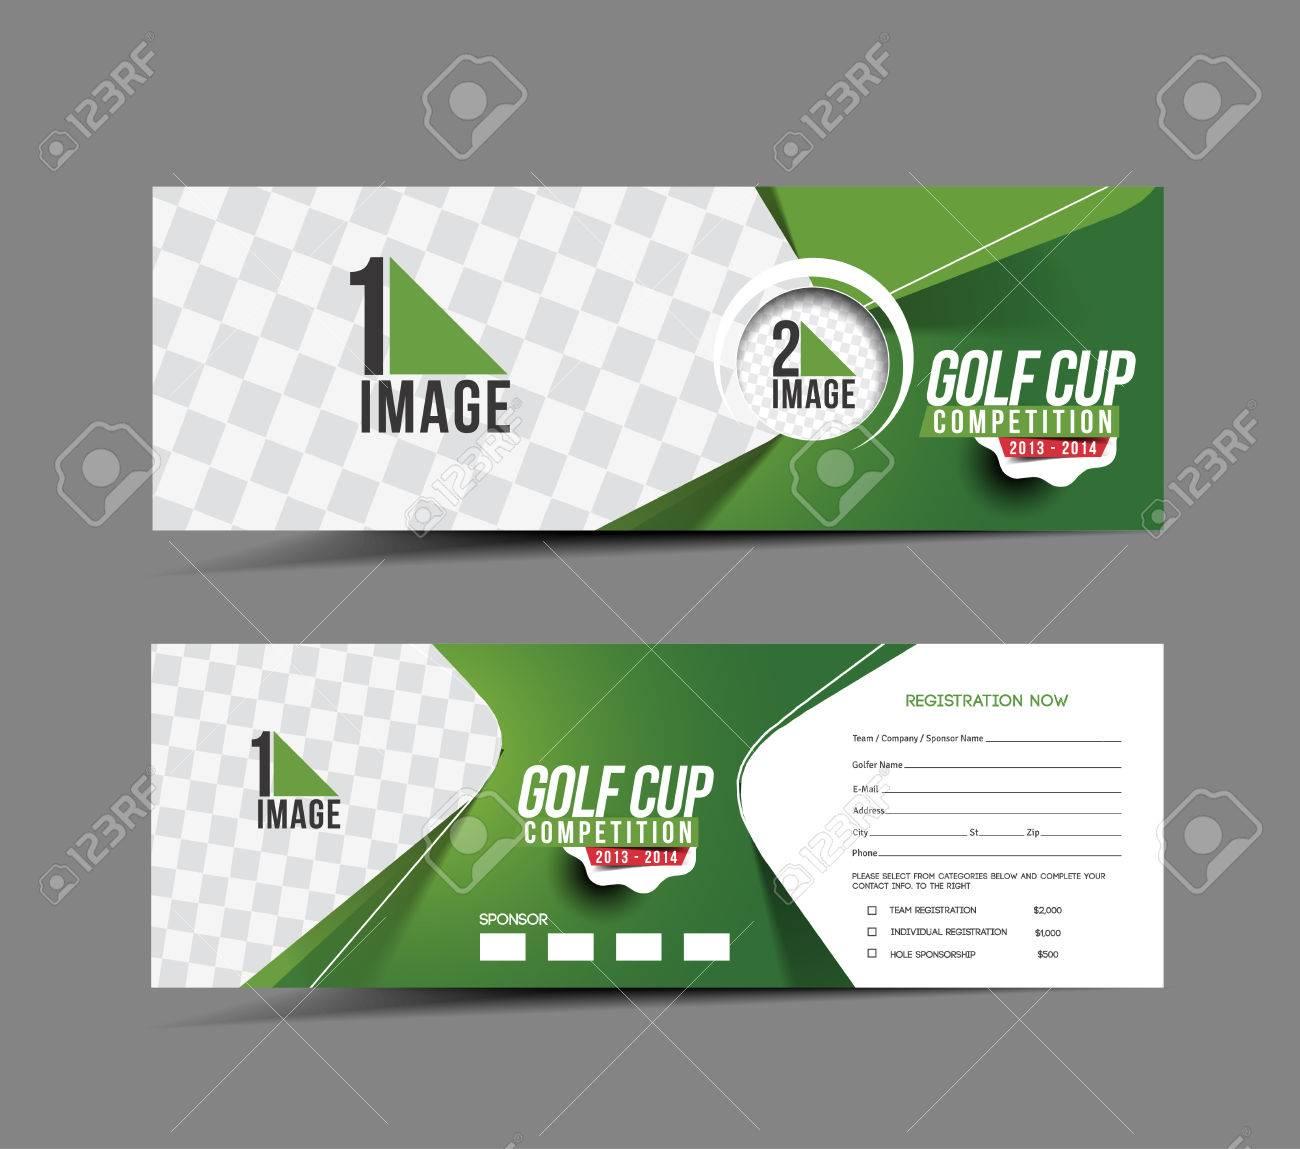 Golf Cup Header & Banner Design Stock Vector - 32080366